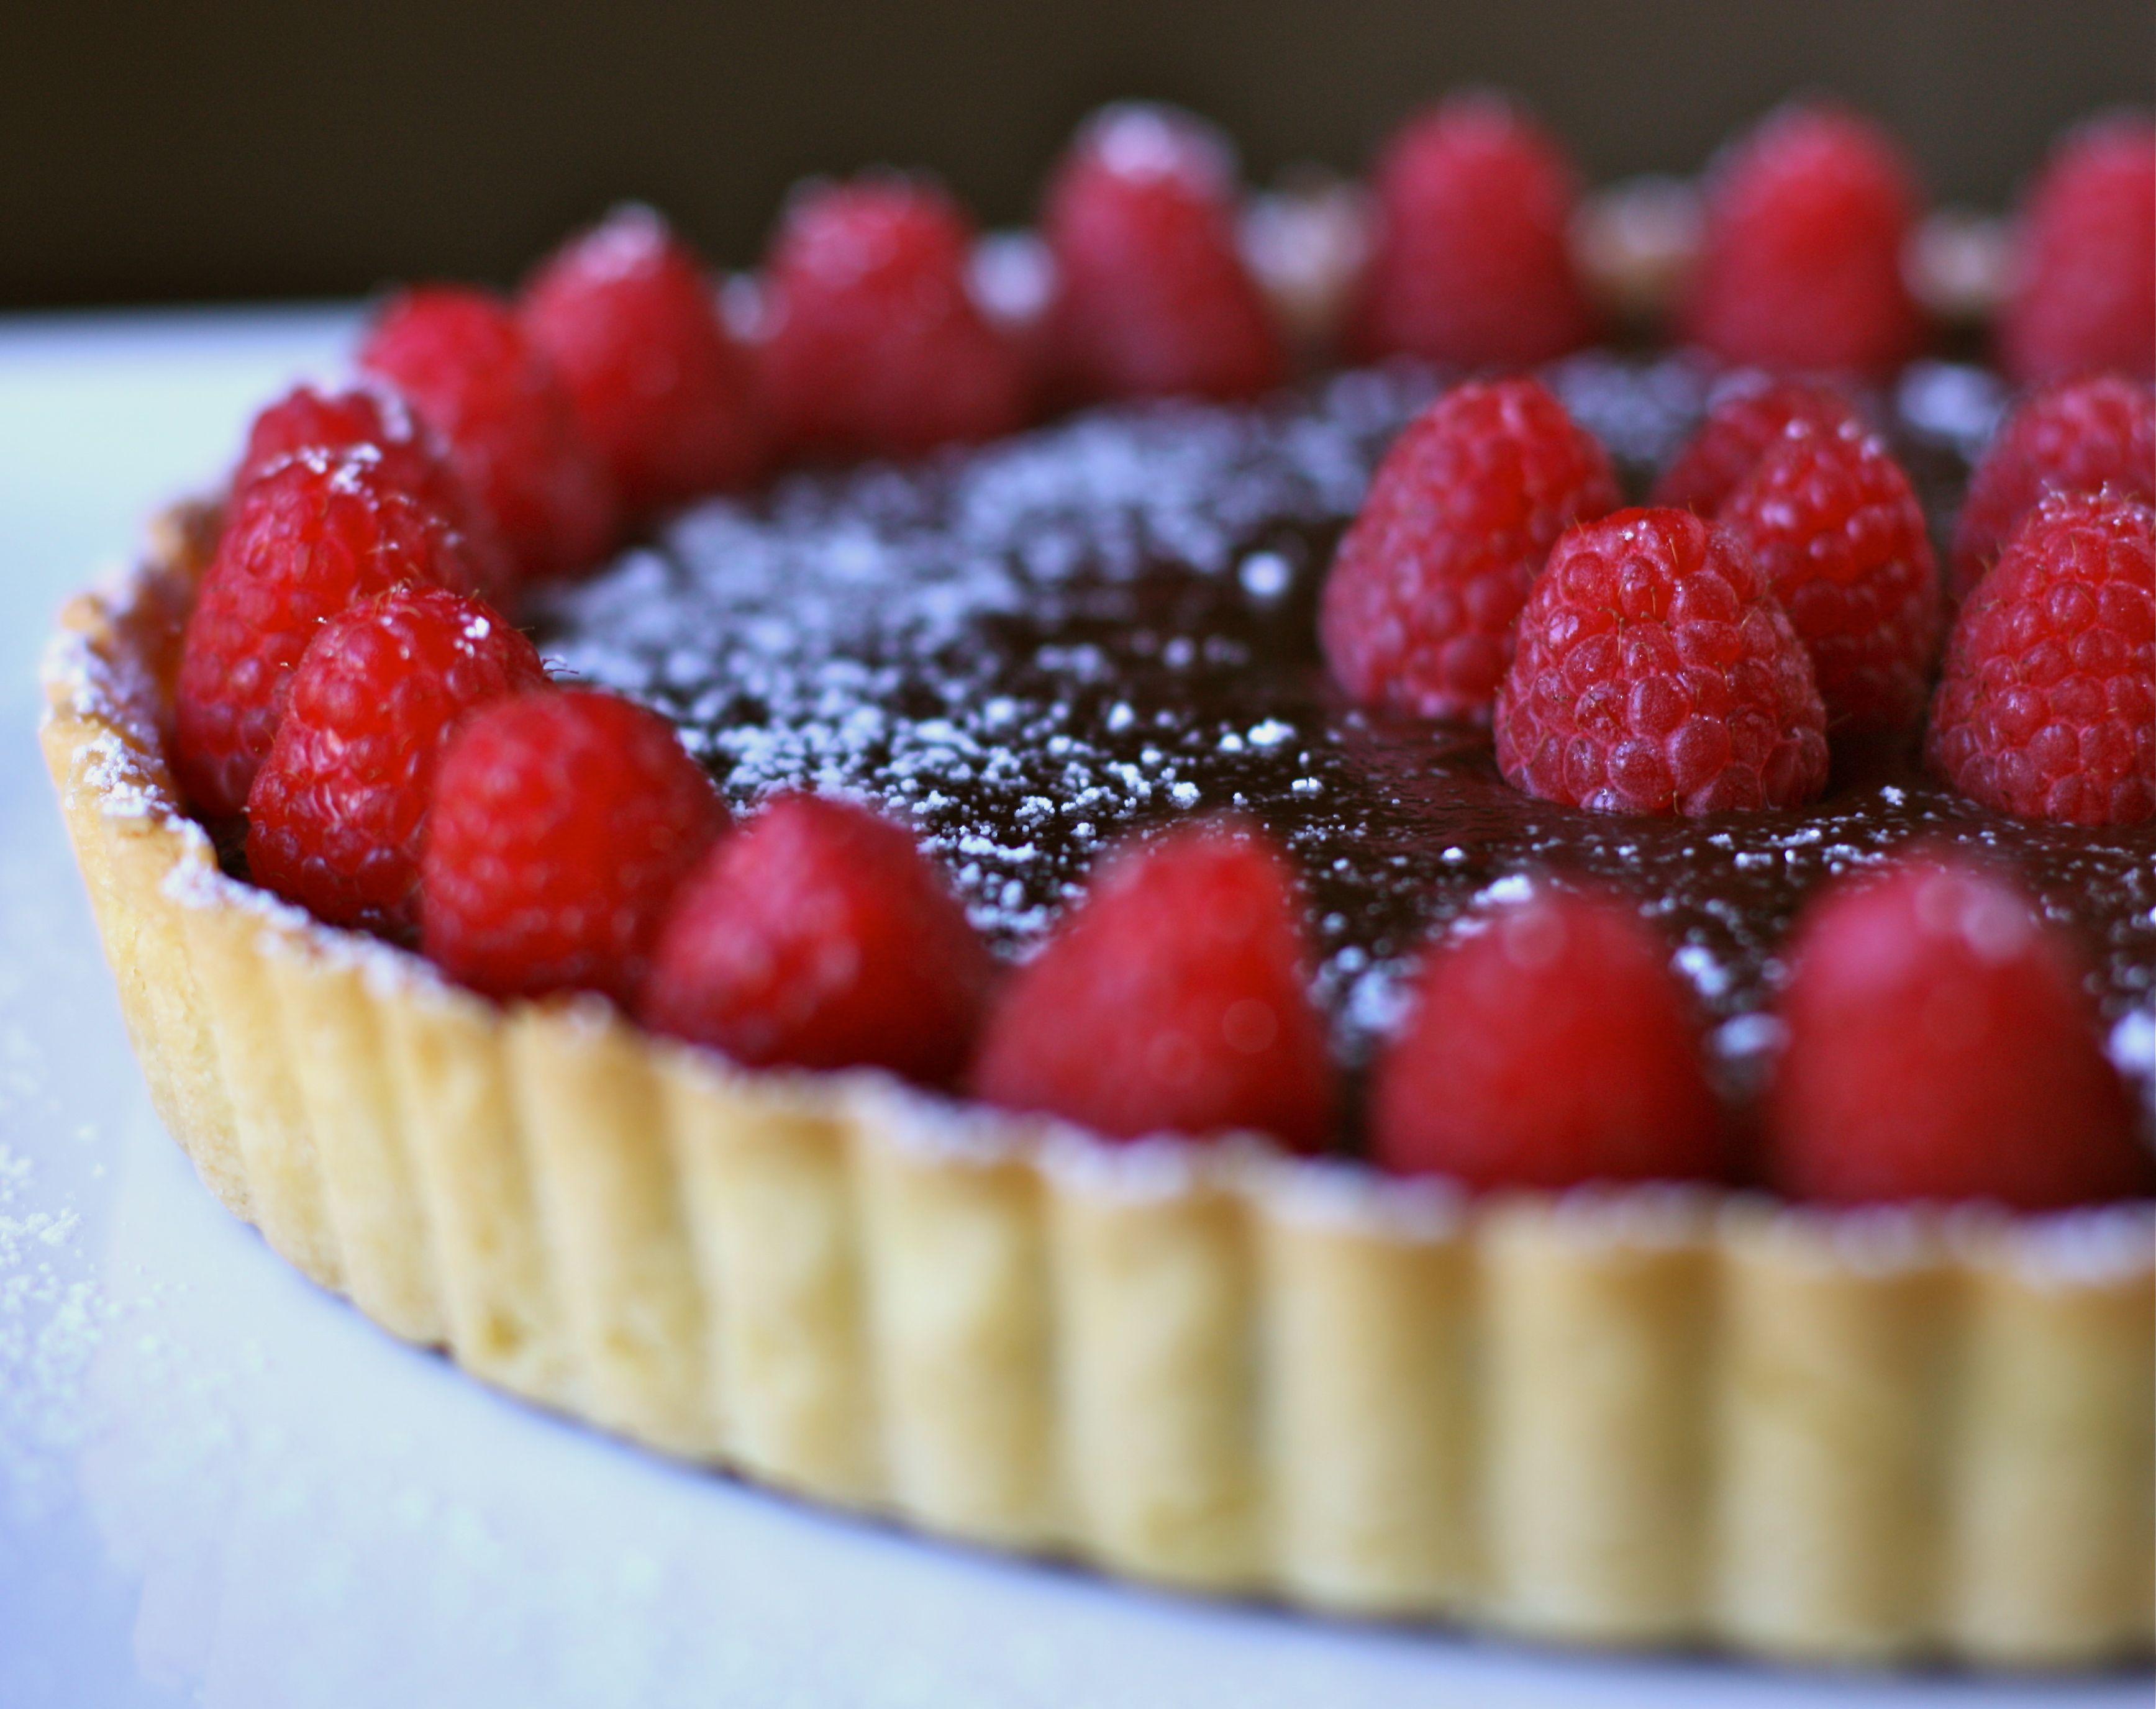 Chocolate Raspberry Ganache Bundt Cake